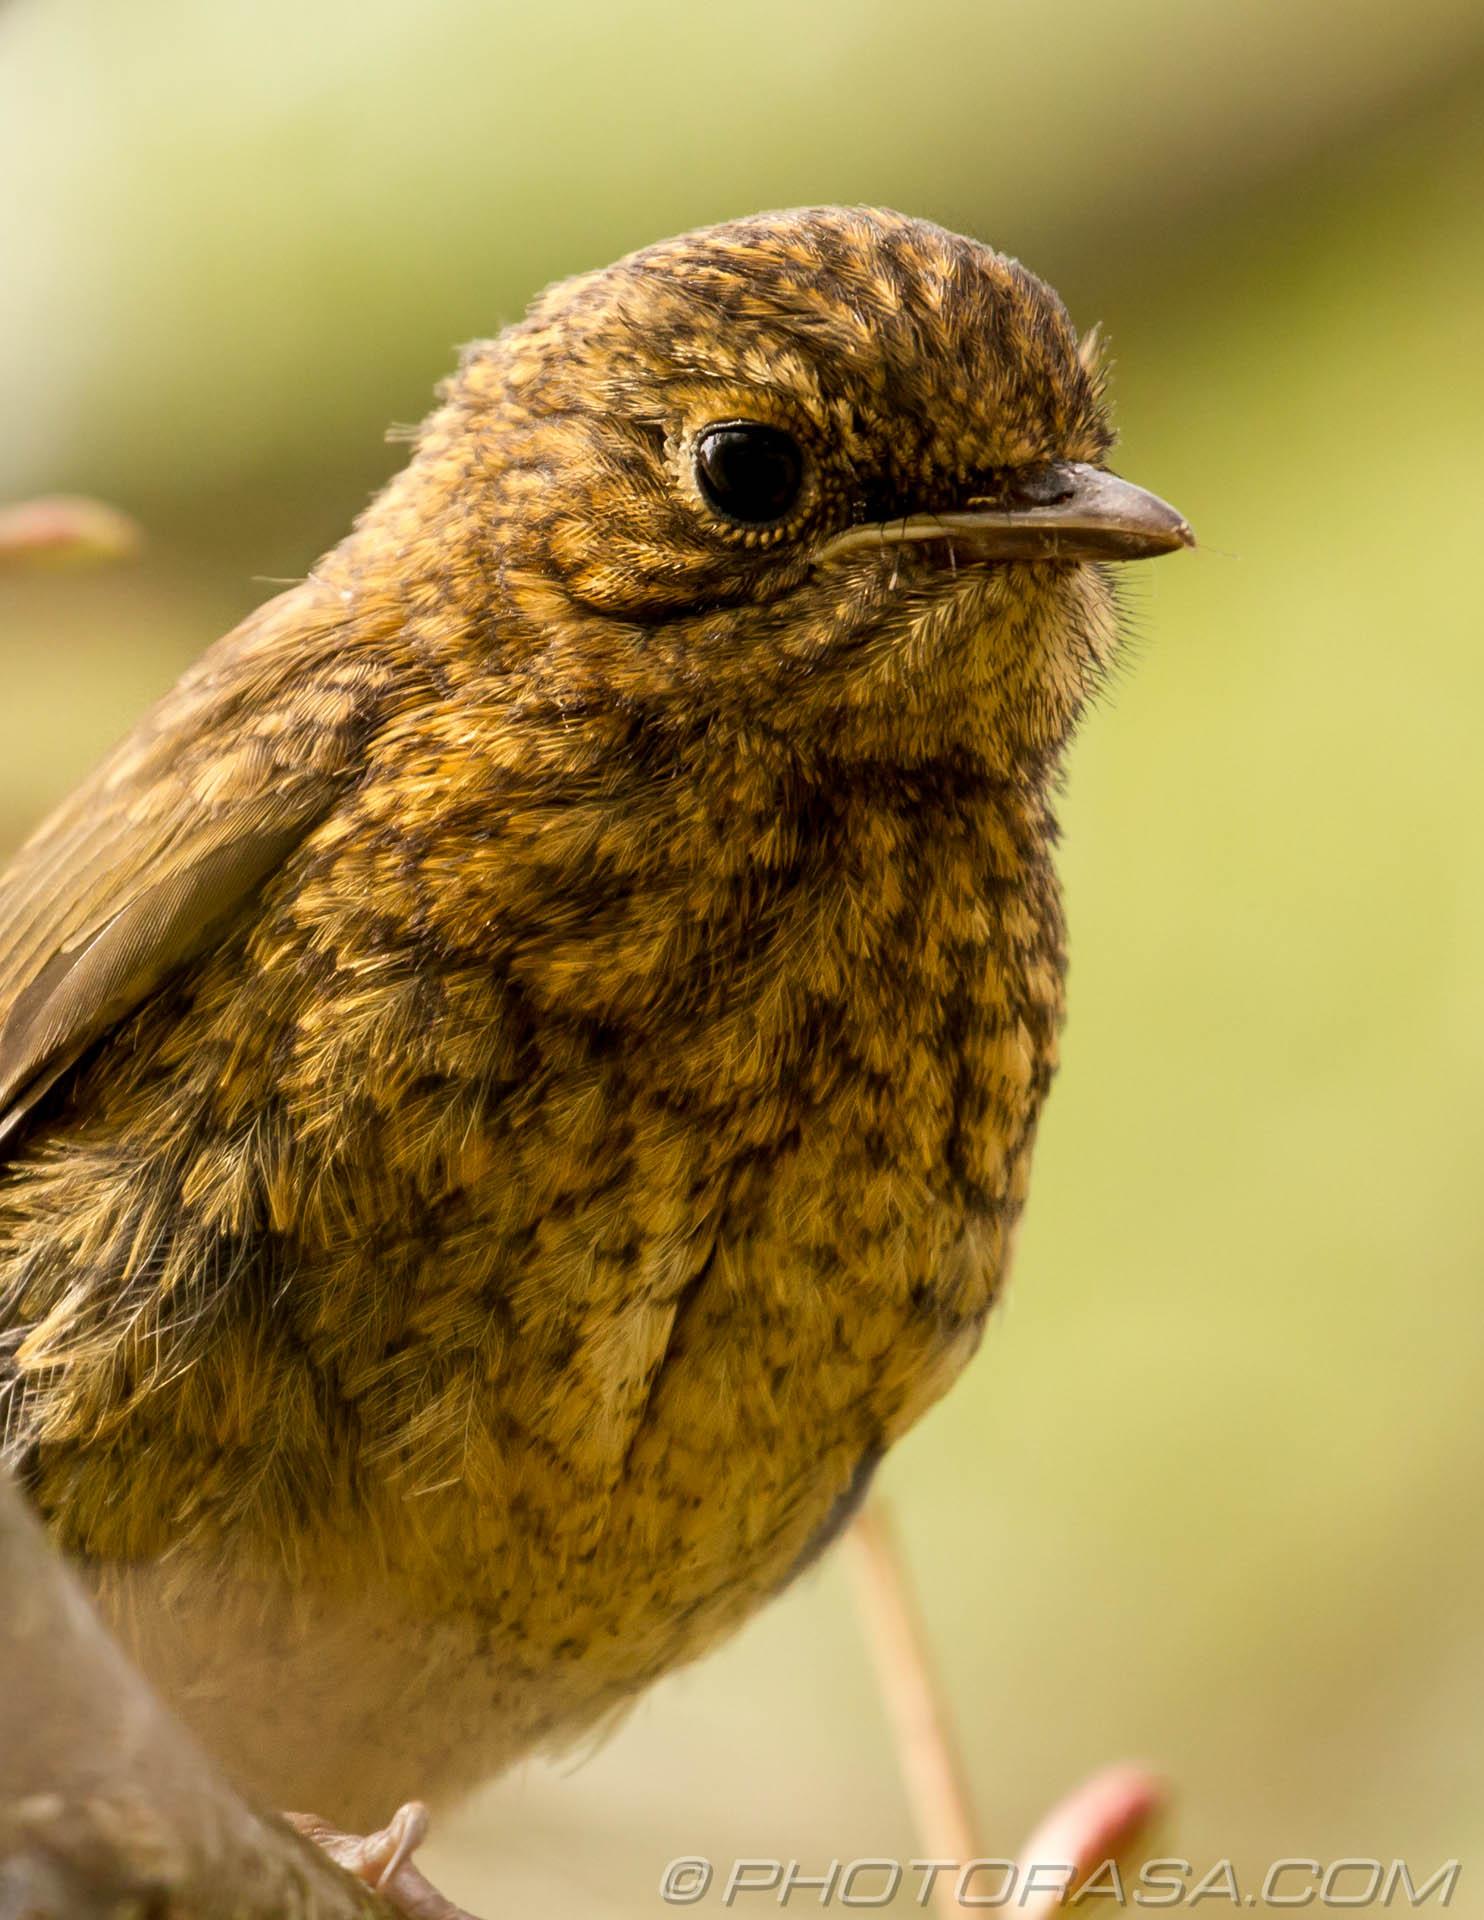 http://photorasa.com/young-robin-brown-orange/fluffy-young-robin/